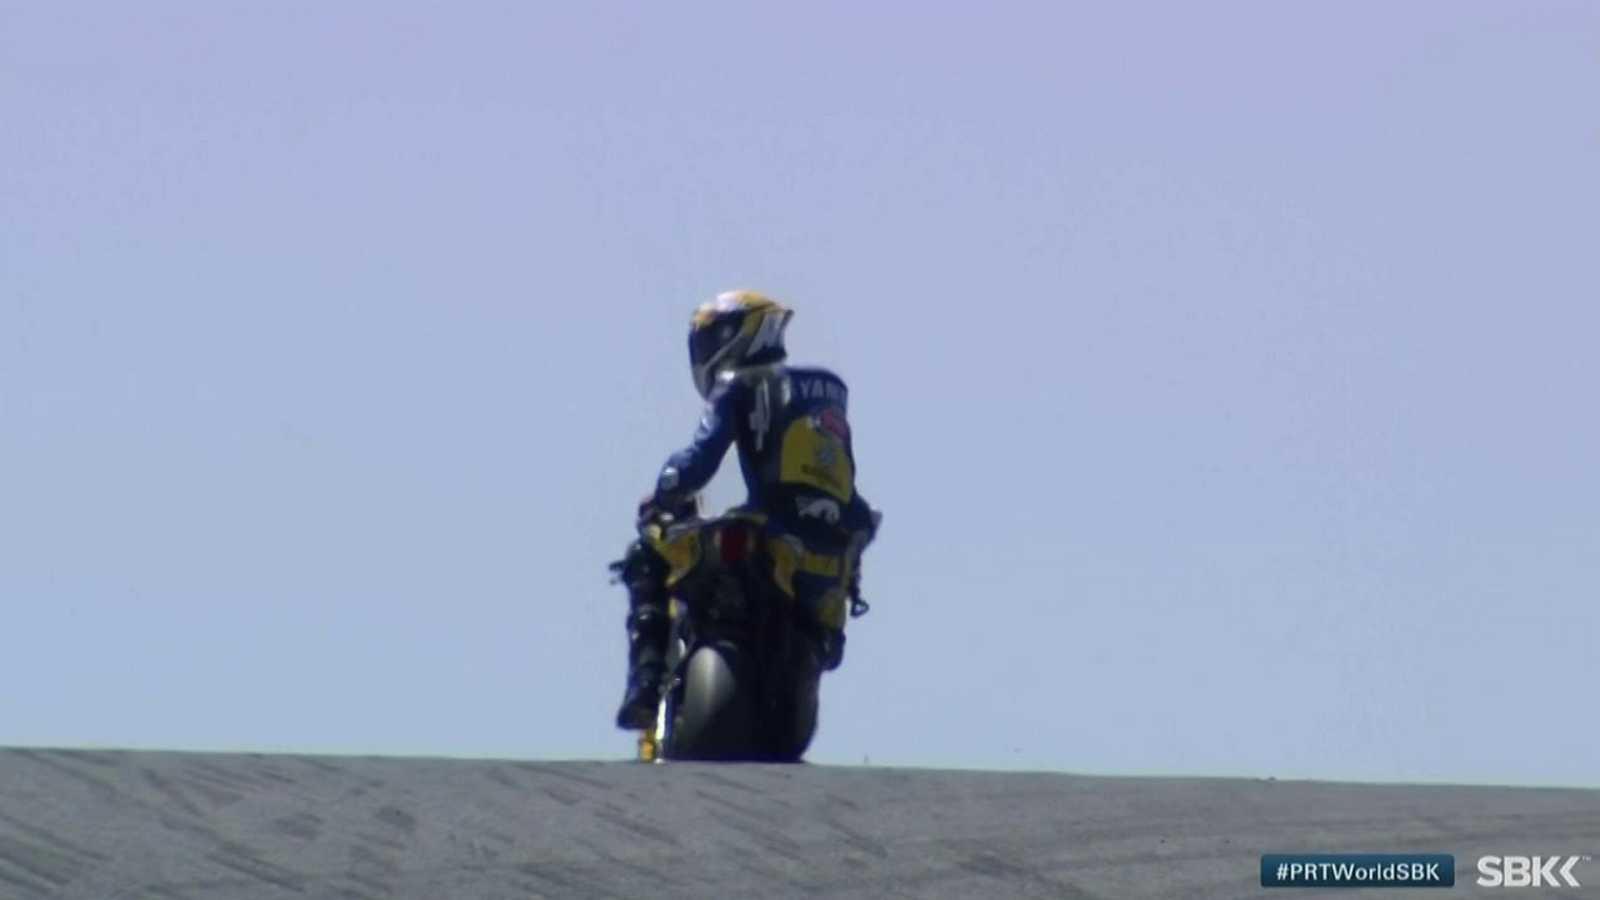 Motociclismo - Campeonato del Mundo Superbike 2020. Prueba Portugal: World Supersport 2ª carrera, desde Portimao (Portugal) - ver ahora